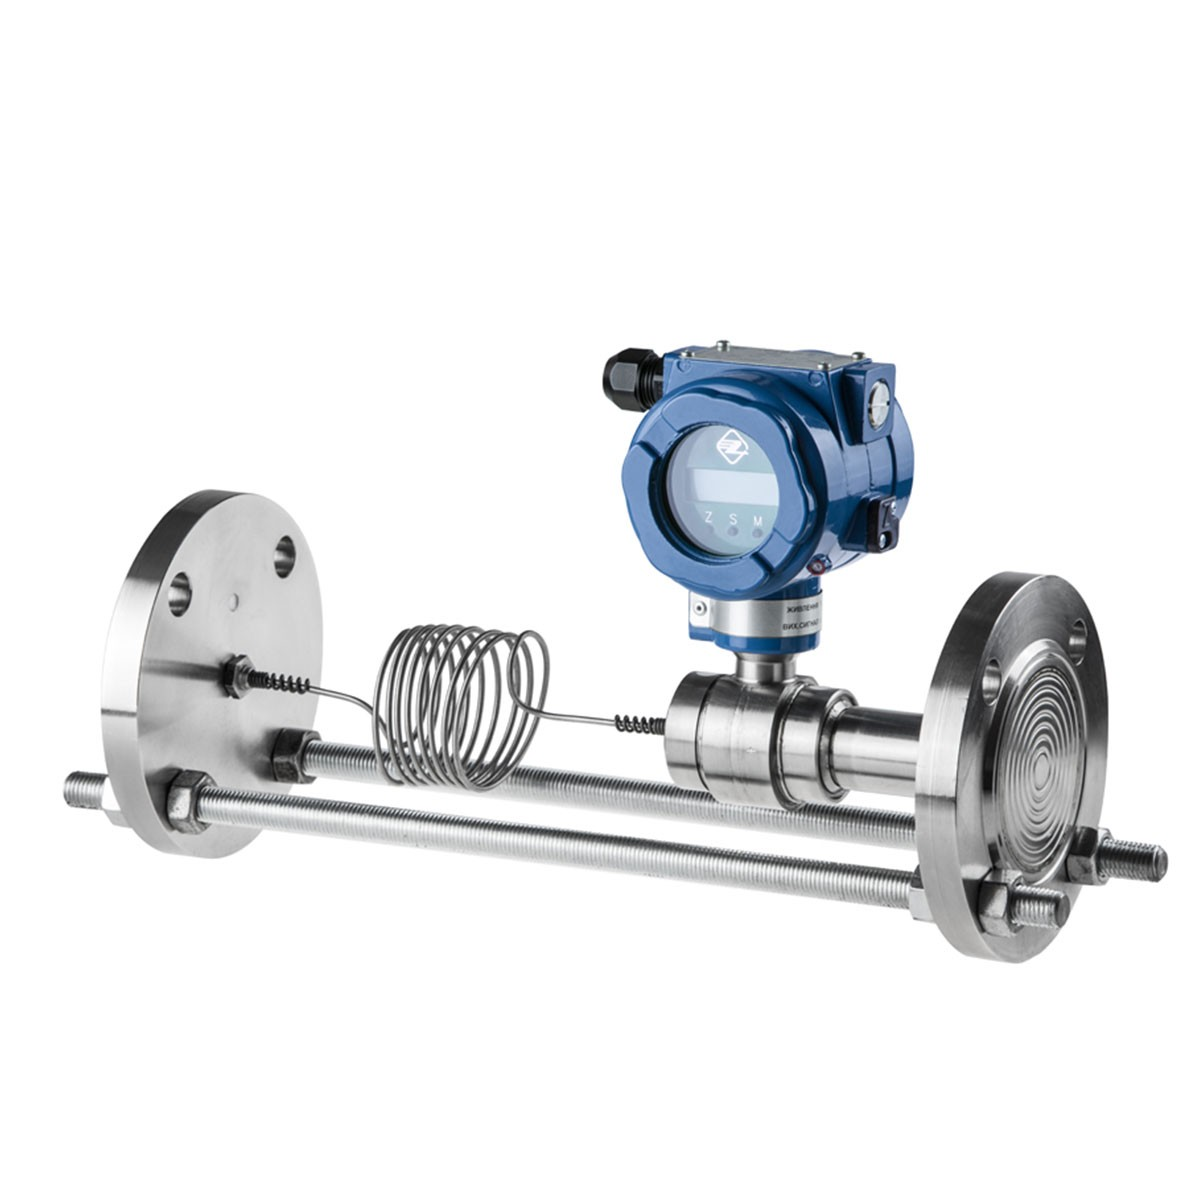 Digital Hydrostatic Pressure Transmitters Safir-M 5520, 5530, 5540